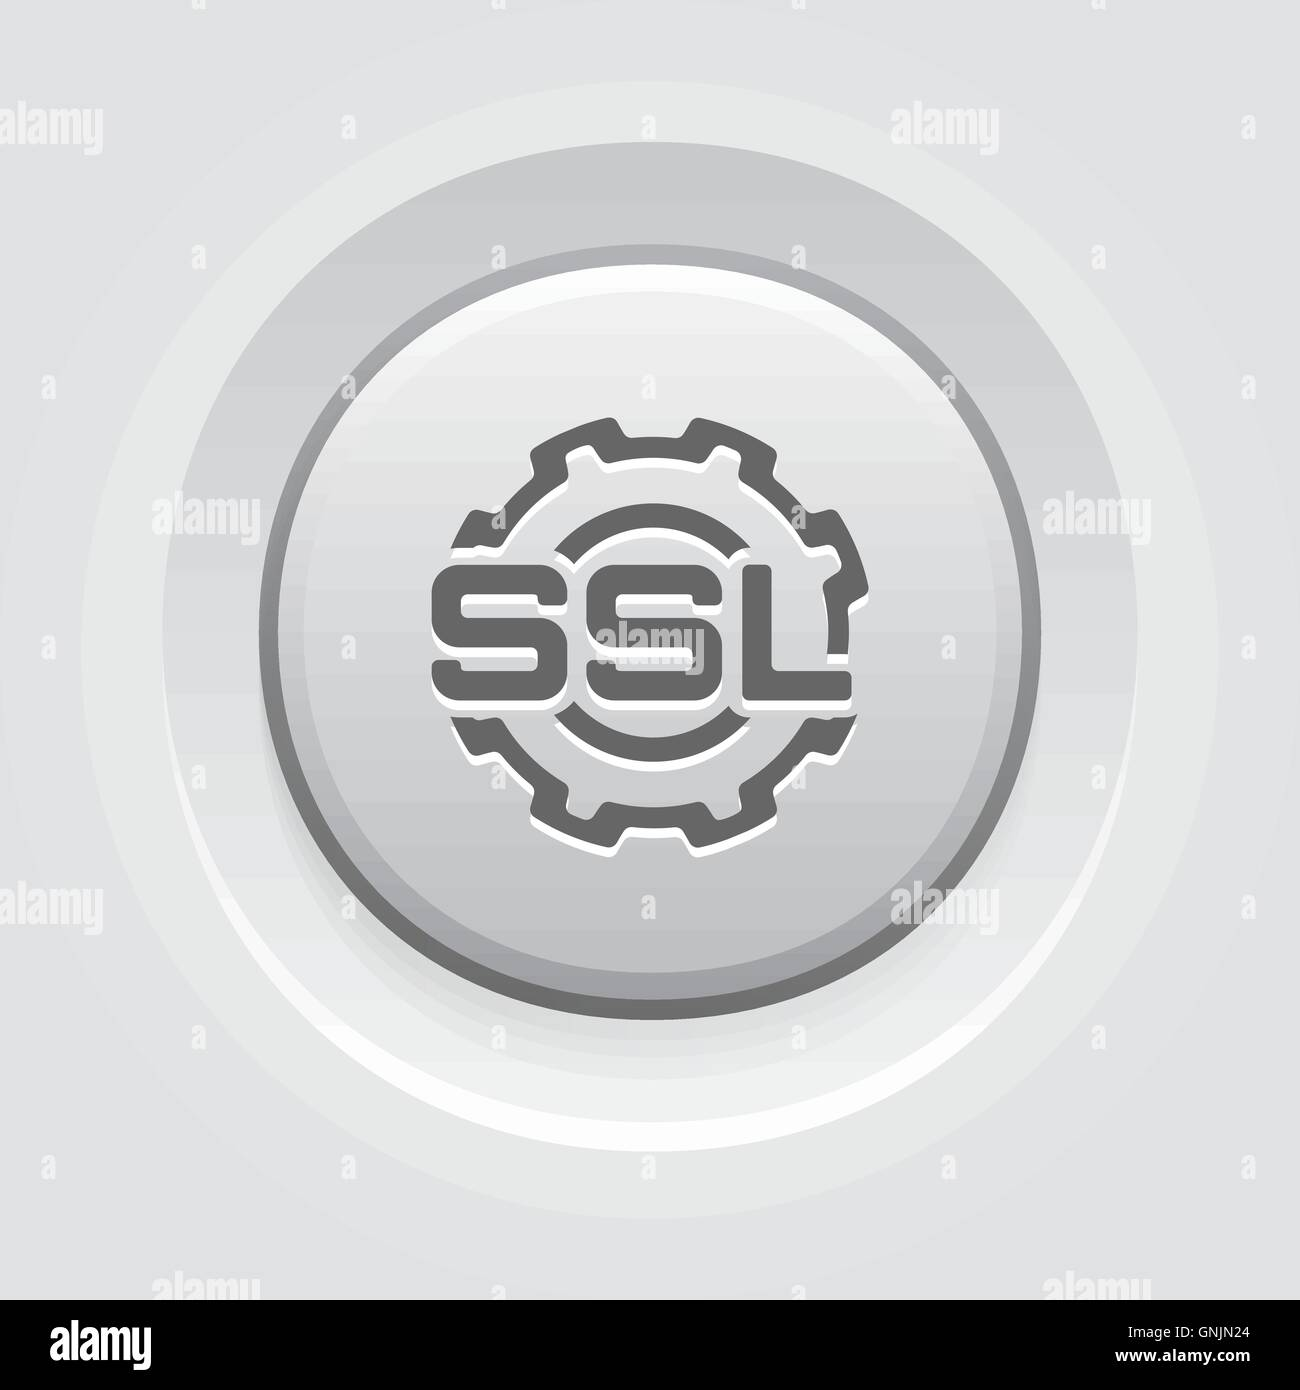 SSL Settings Icon. Flat Design. - Stock Image